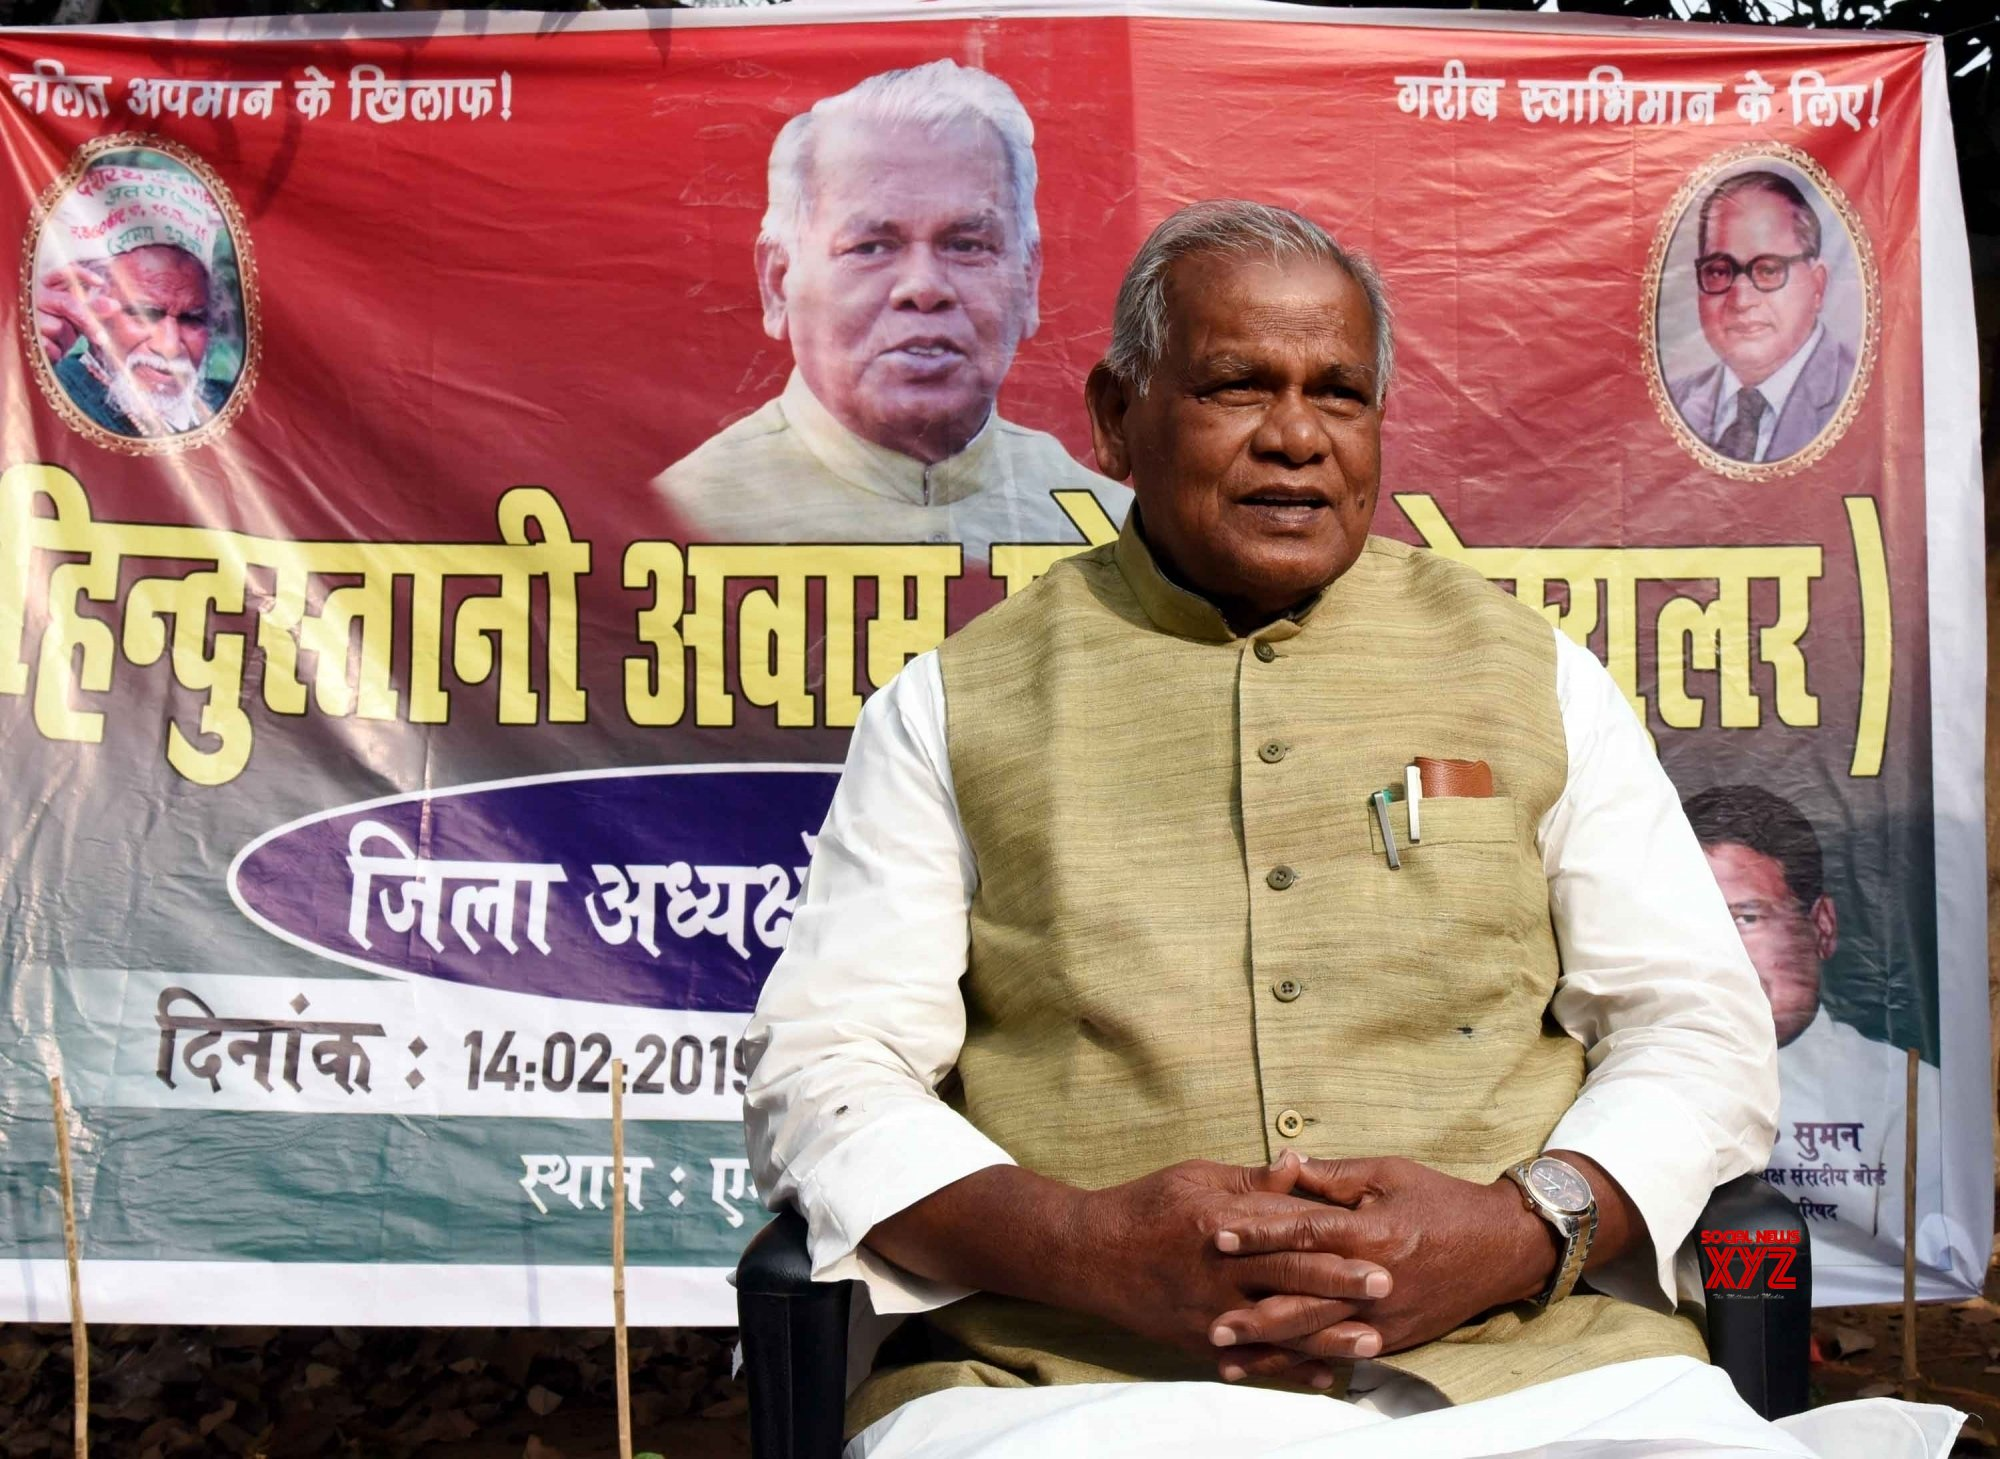 Patna: Jitan Ram Manjhi's press conference #Gallery